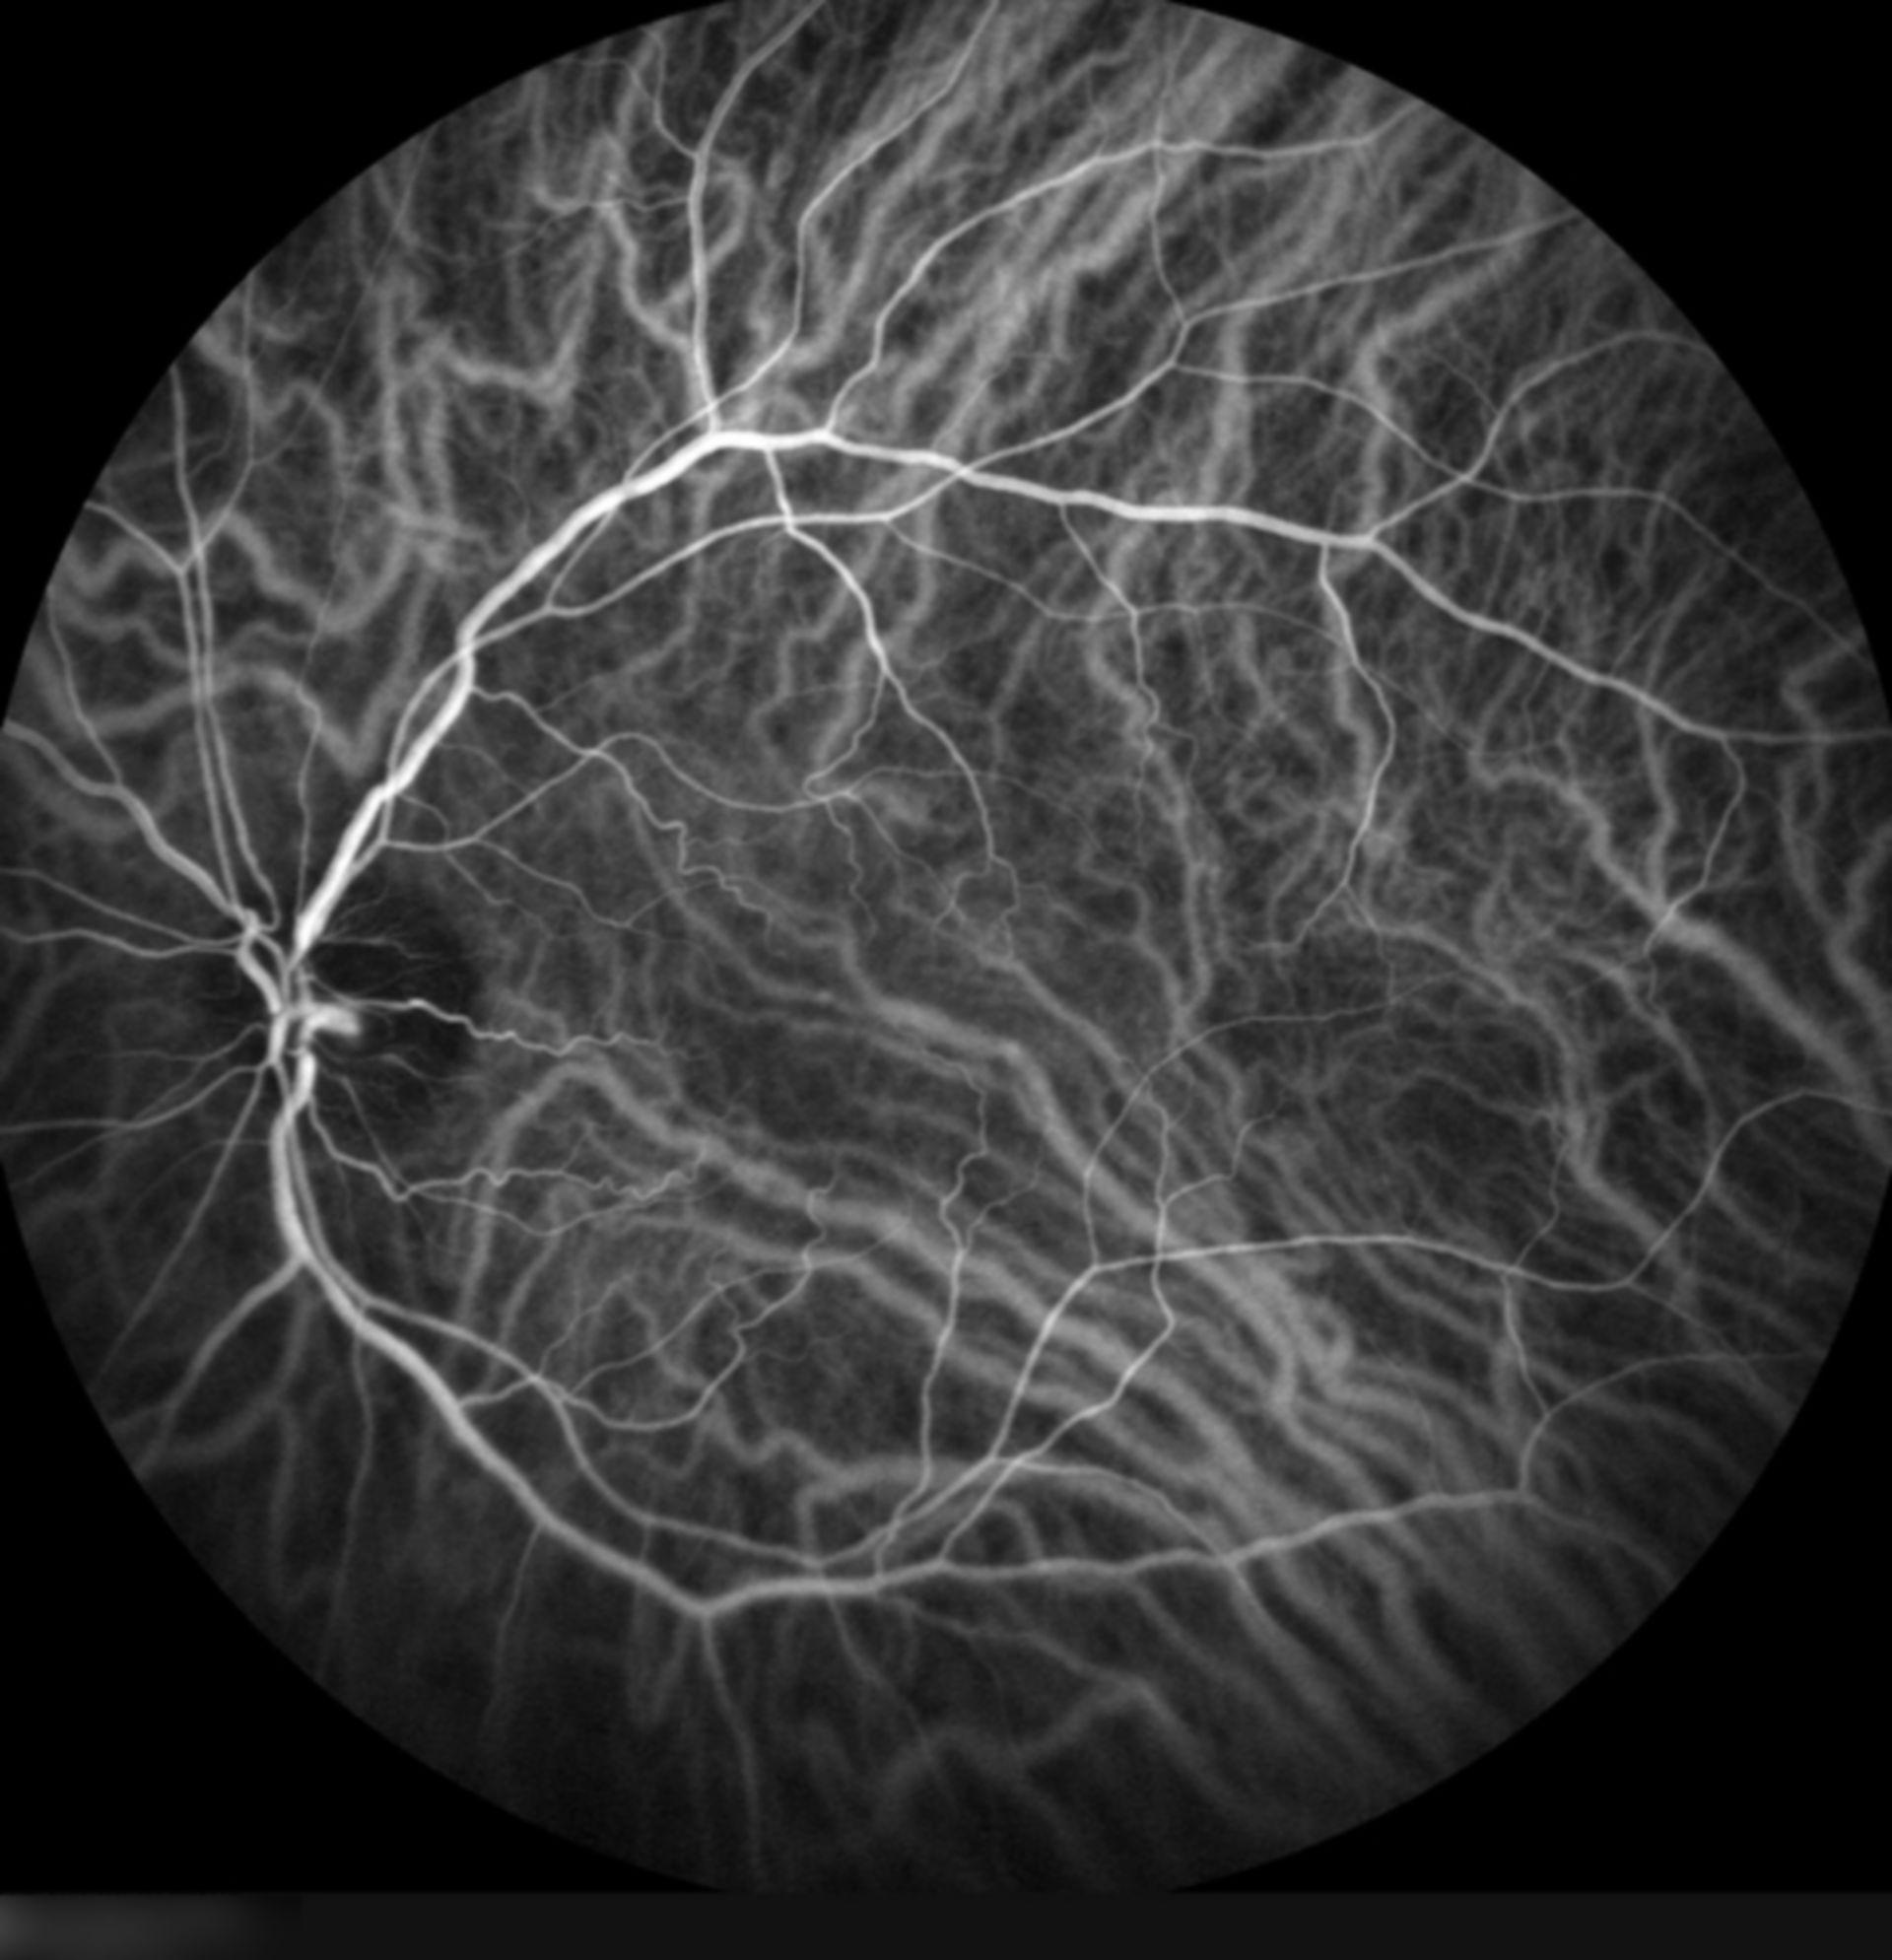 Angiografia oculare con verde indocianina (ICGA)